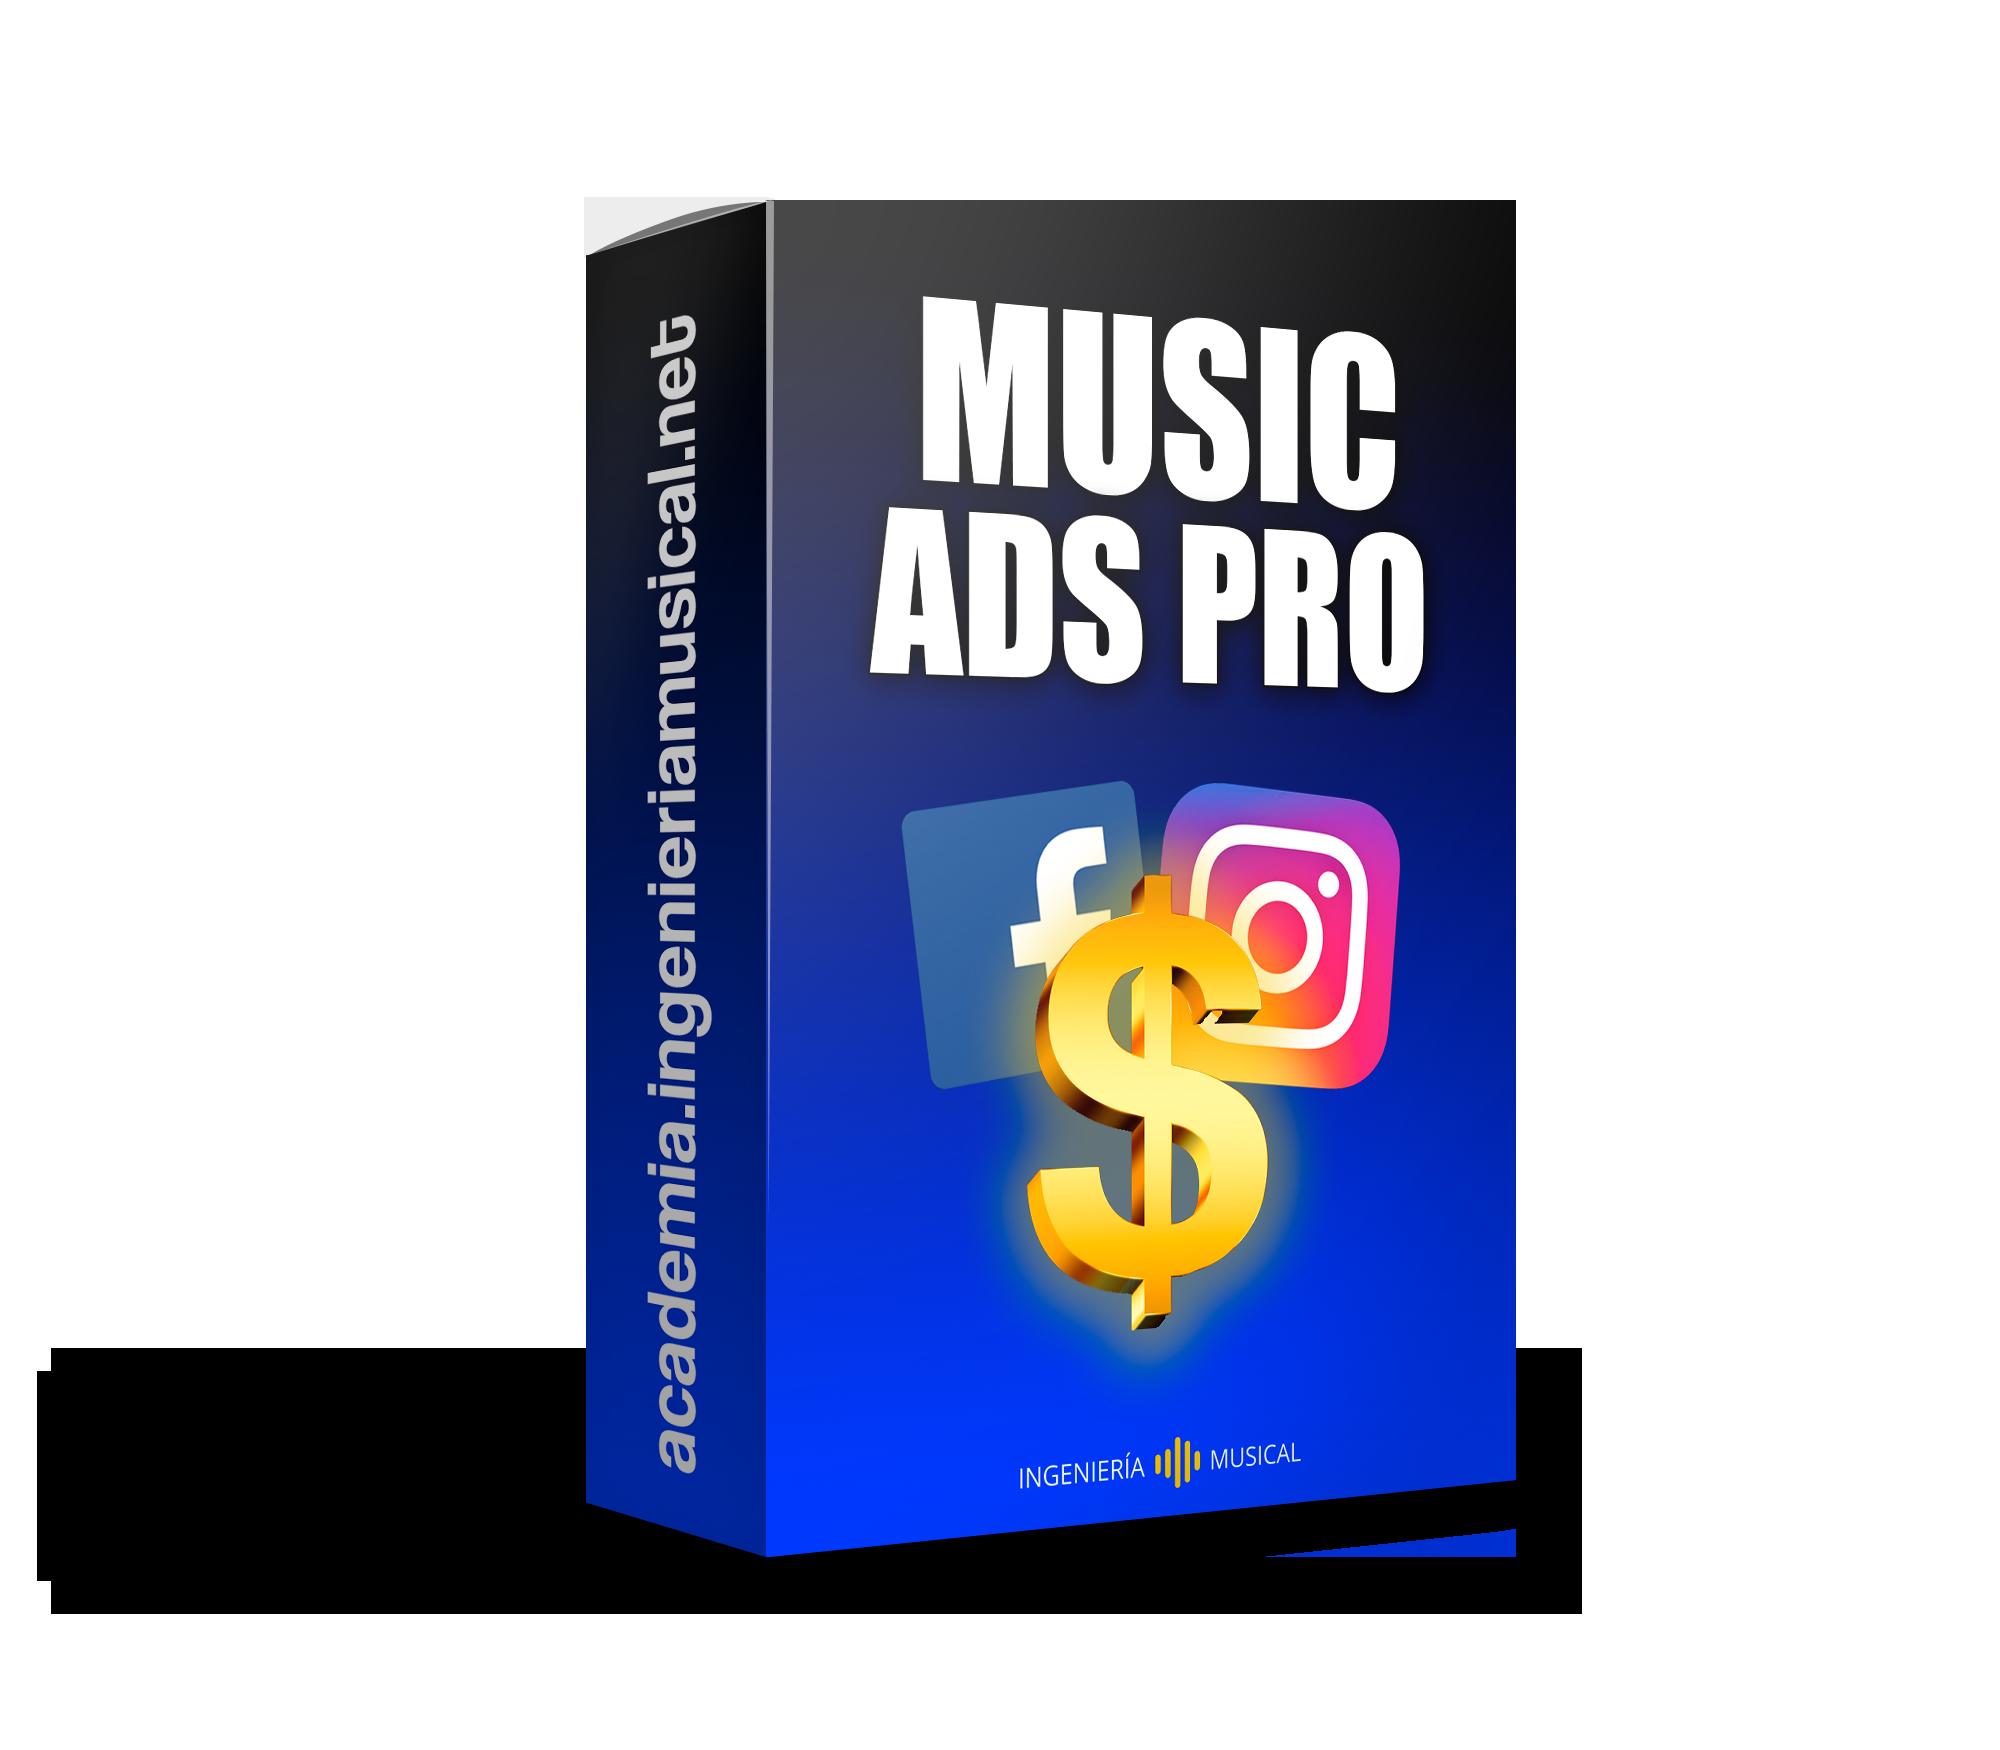 Music ADS Pro